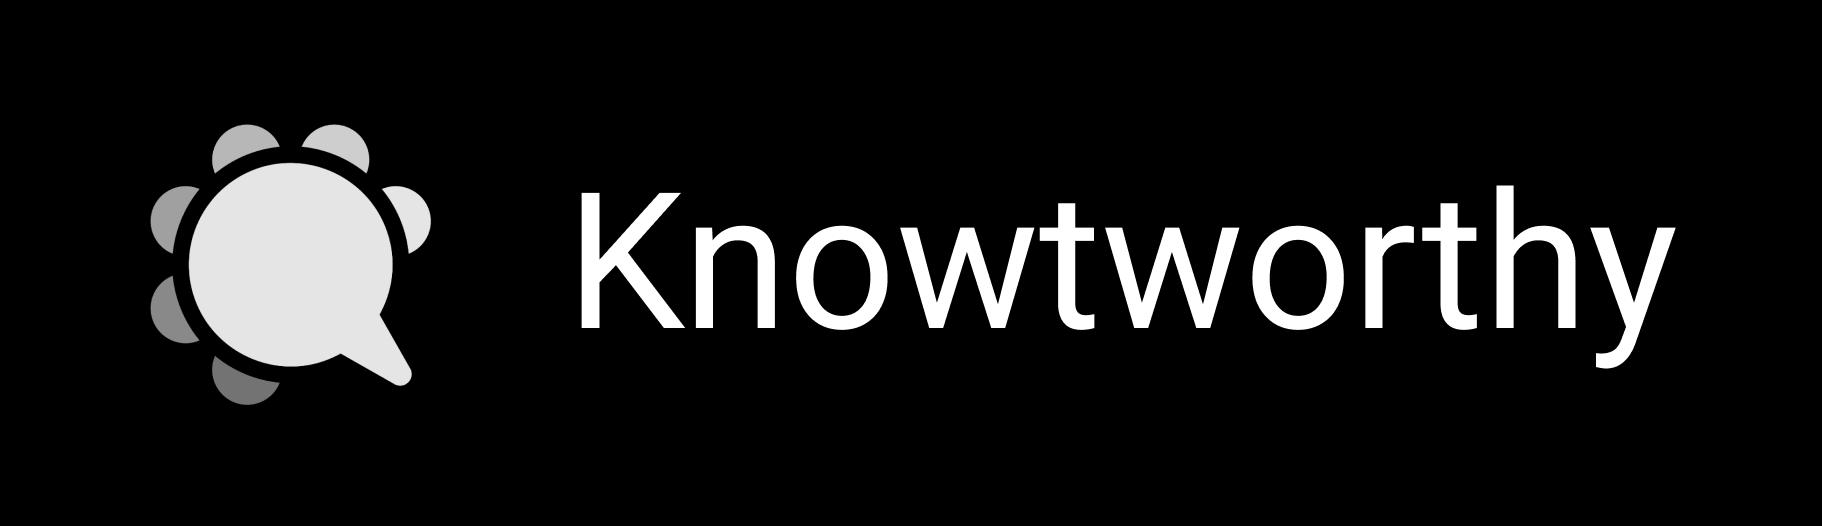 Black Knowtworthy logo with Company Name